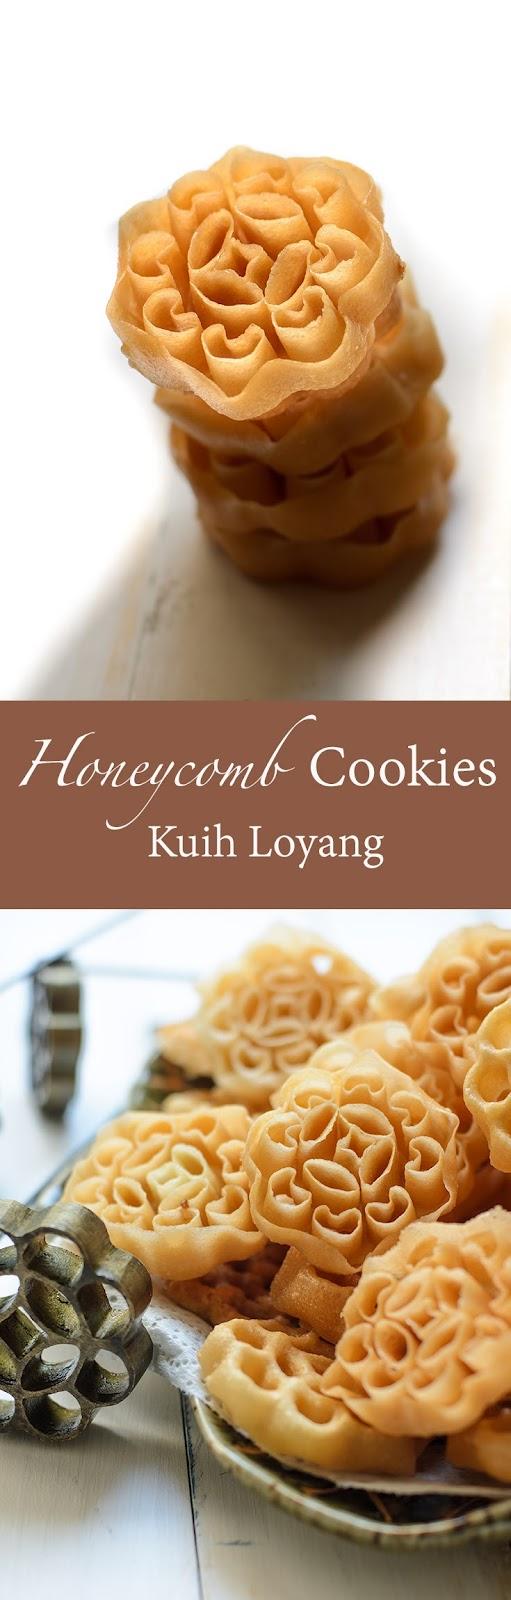 Honeycomb Cookies/ Kuih Loyang is crispy, light, sweet and taste creamy from coconut milk.